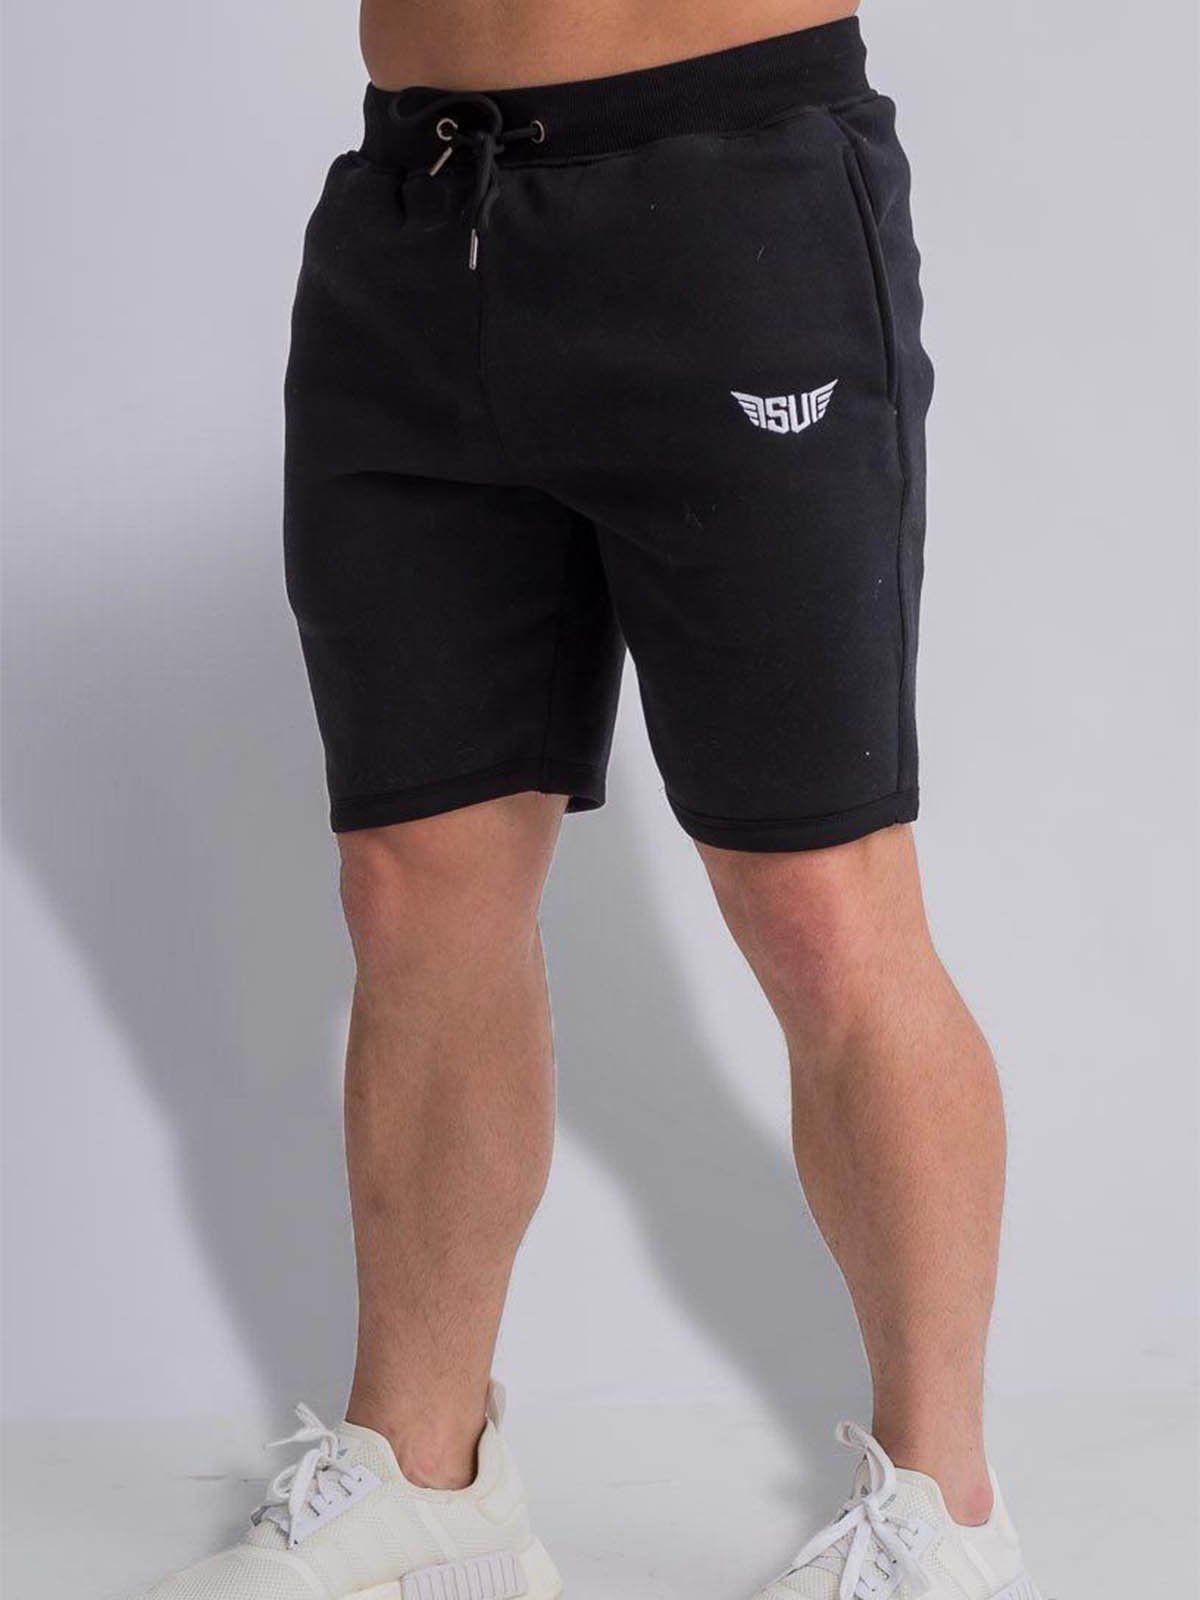 Size Up Workout Shorts Black Athletic Pants For Men Size Up Apparel Men Mensfashion Menswear Mens Workout Shorts Black Athletic Pants Mens Fashion Swag [ 1600 x 1200 Pixel ]